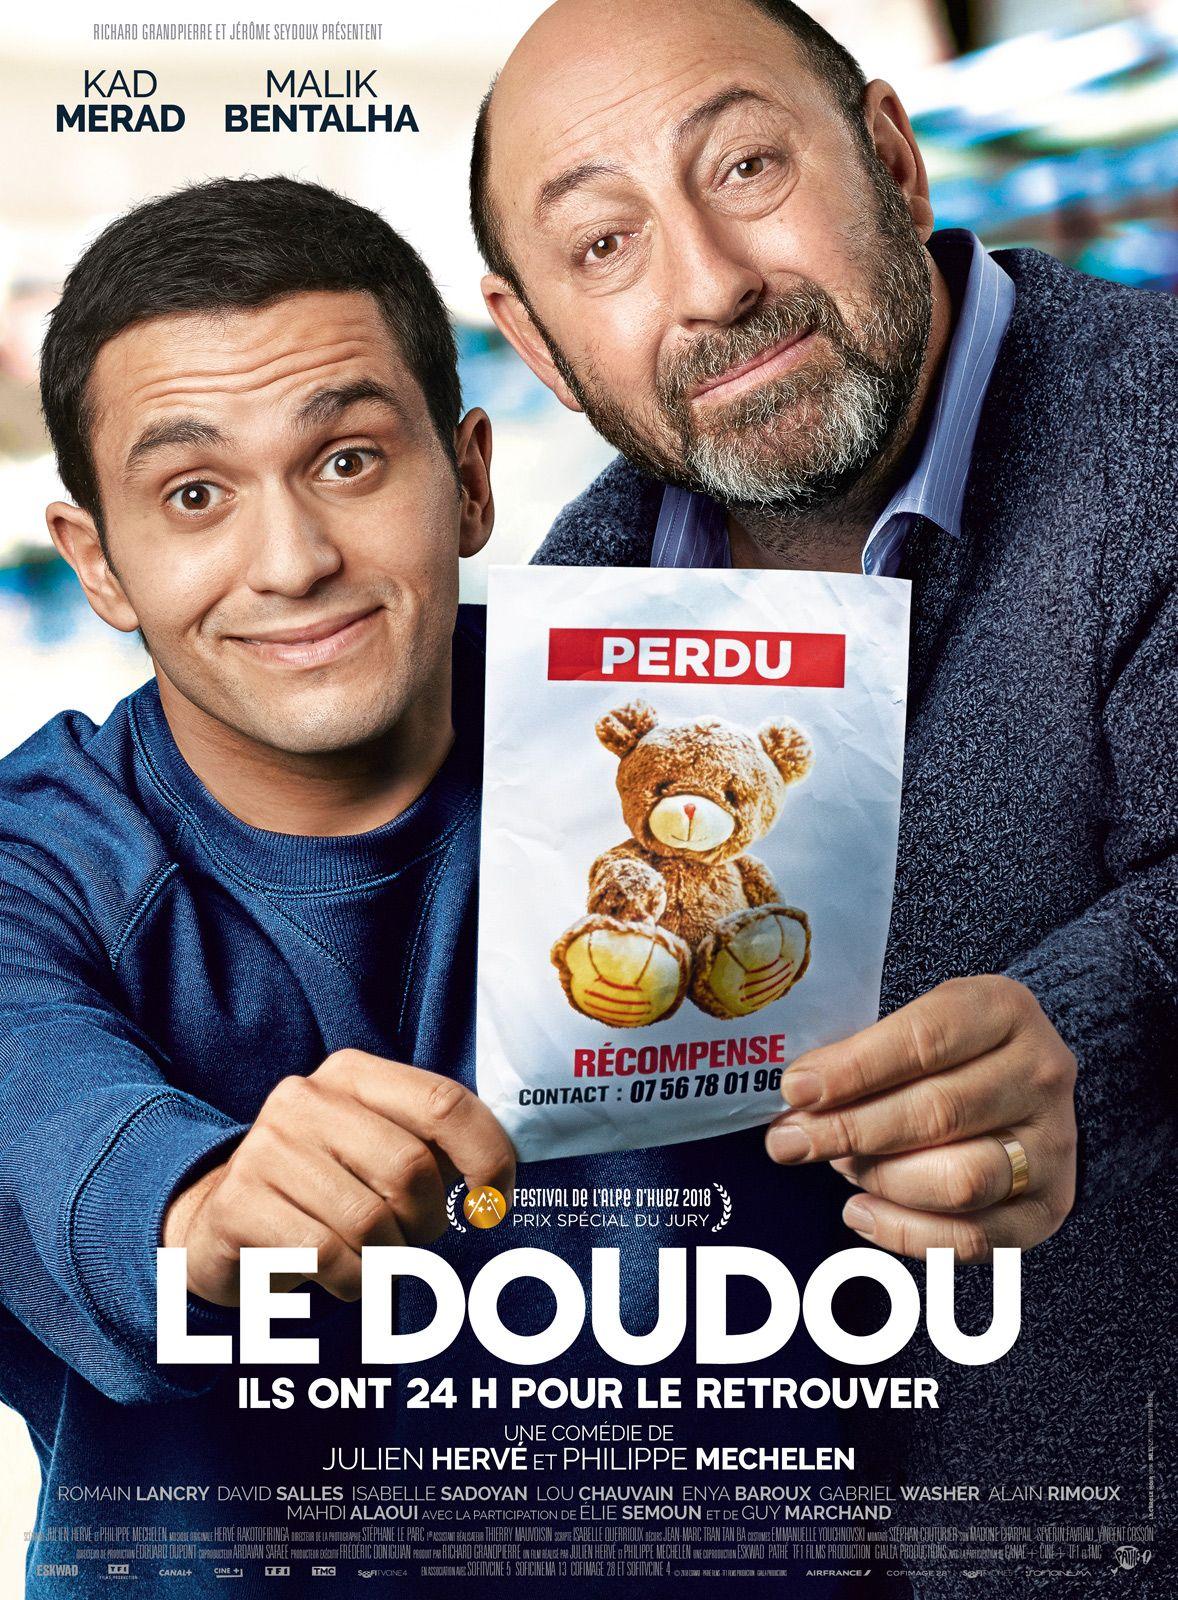 SUPERCONDRIAQUE TÉLÉCHARGER GRATUITEMENT FILM